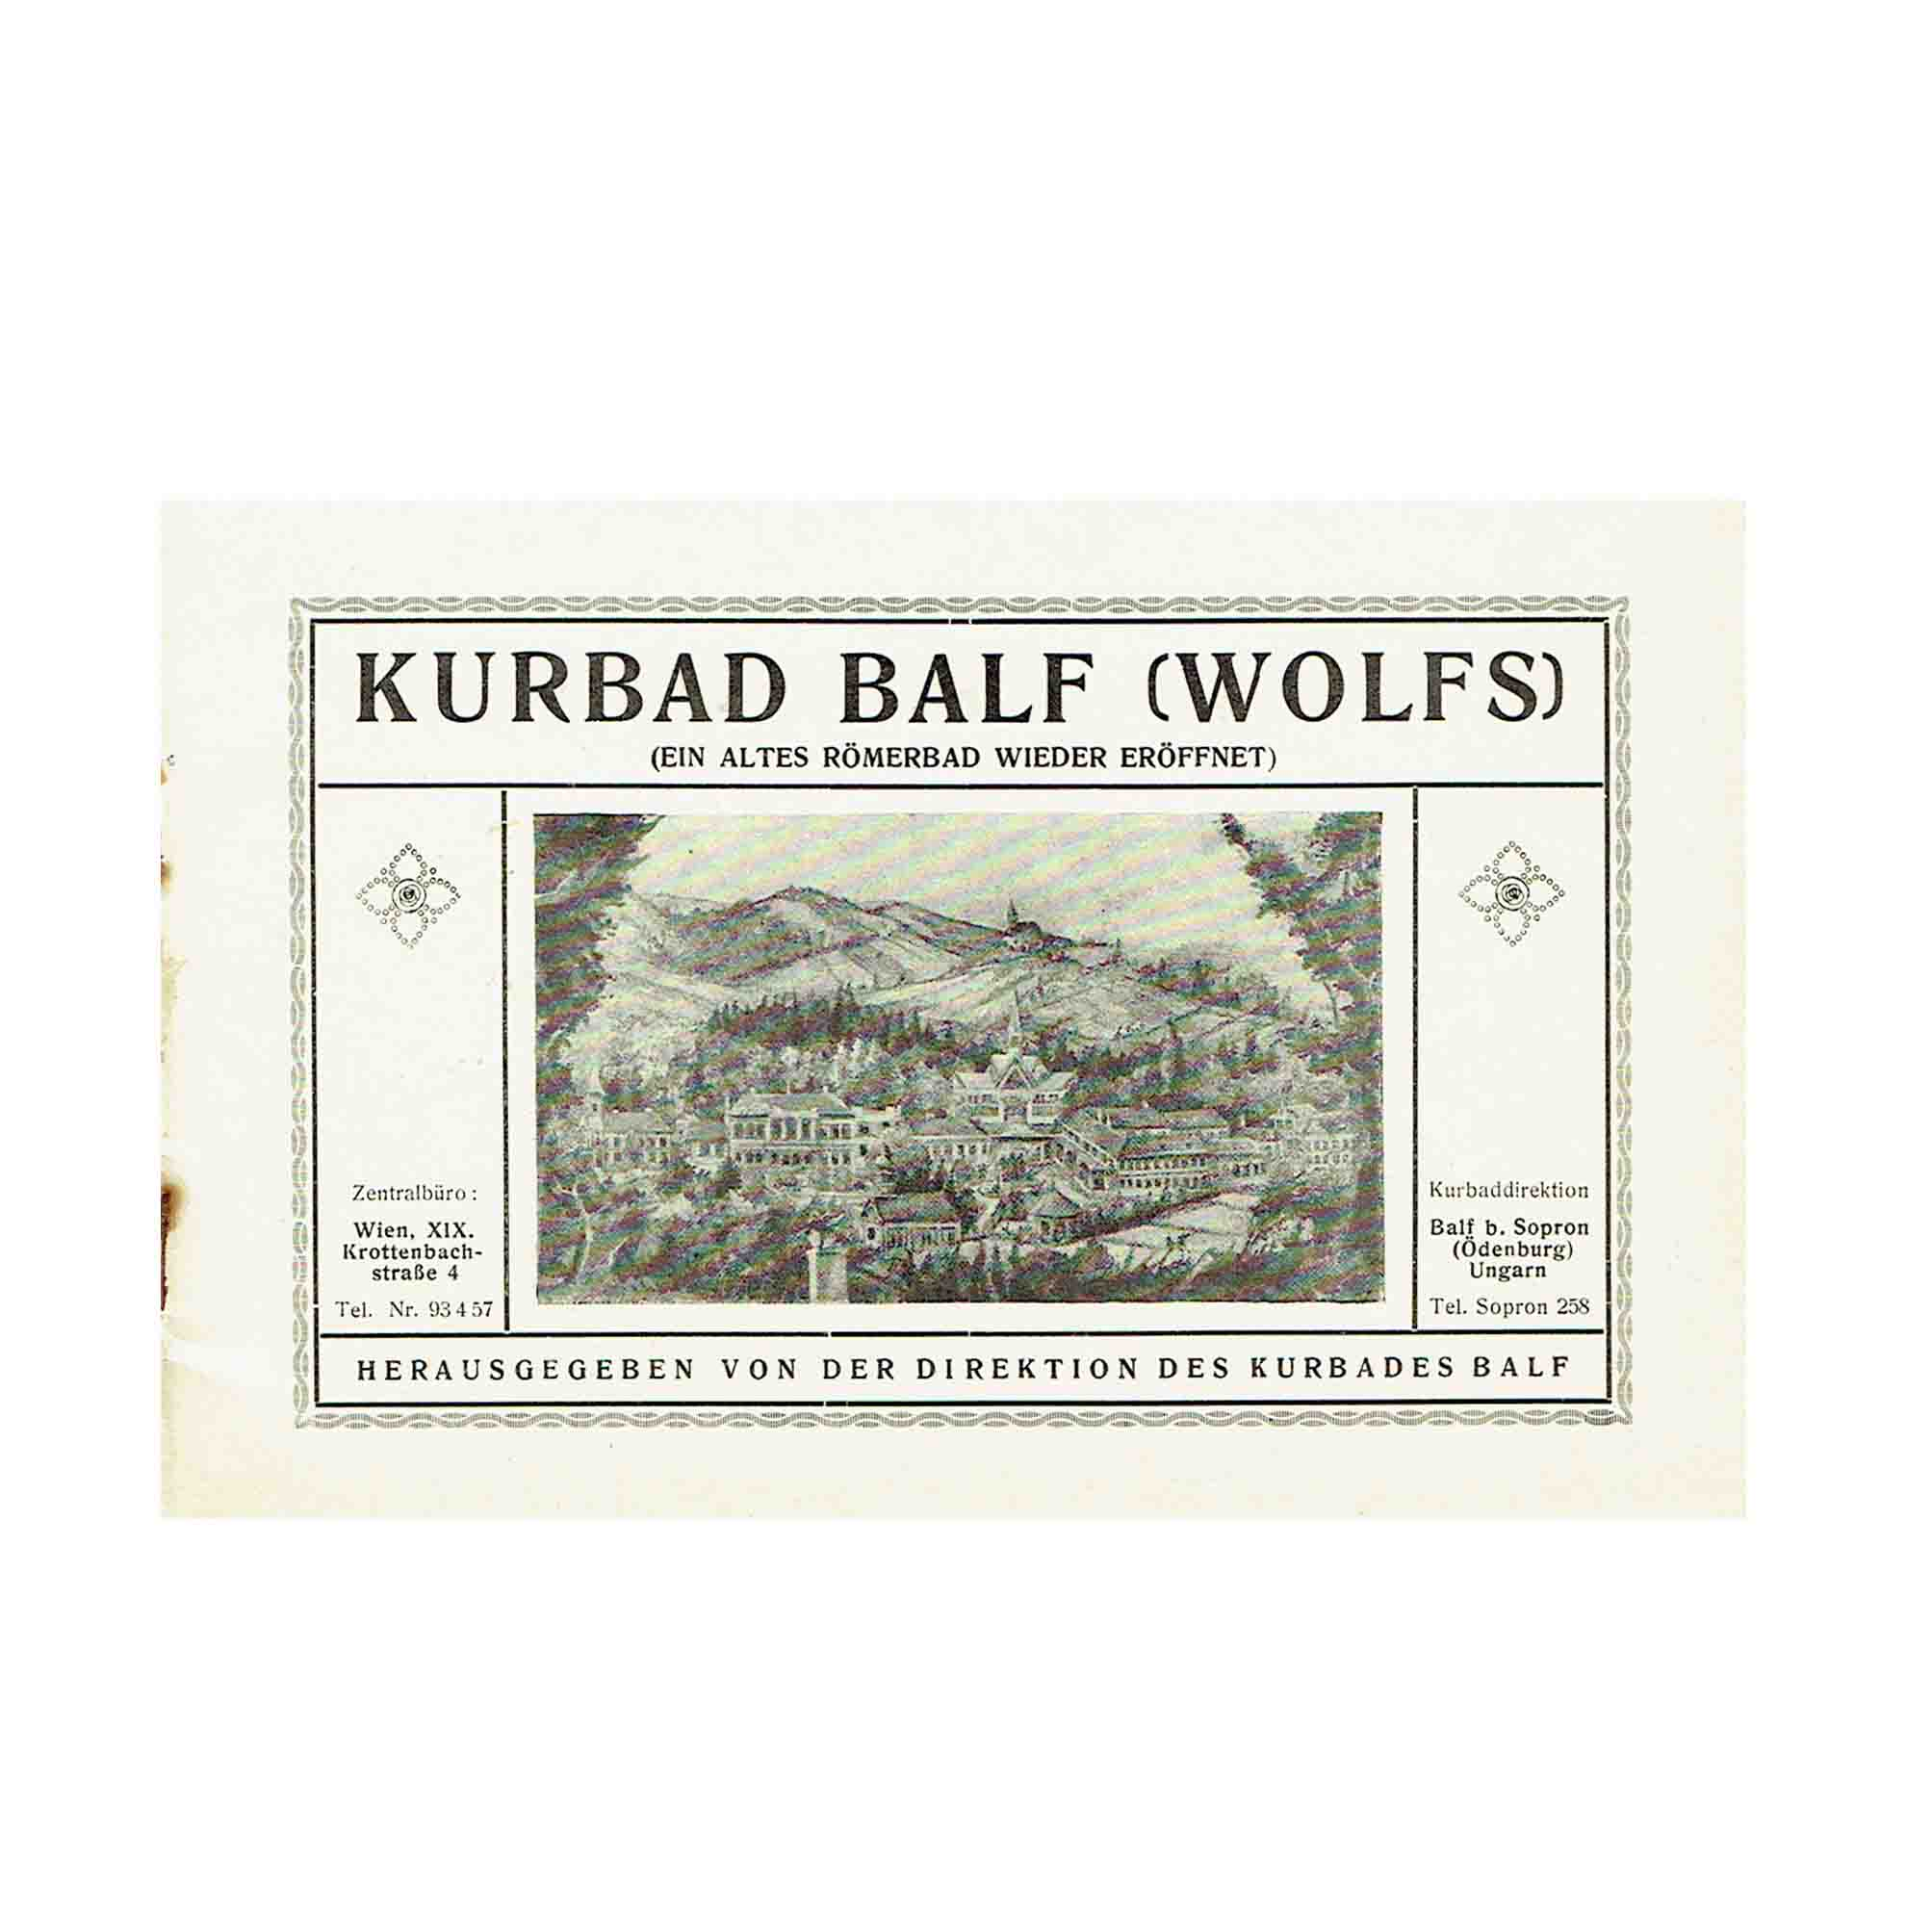 5671-Prospekt-Kurbad-Balf-1900-Umschlag-Illustration-N.jpg